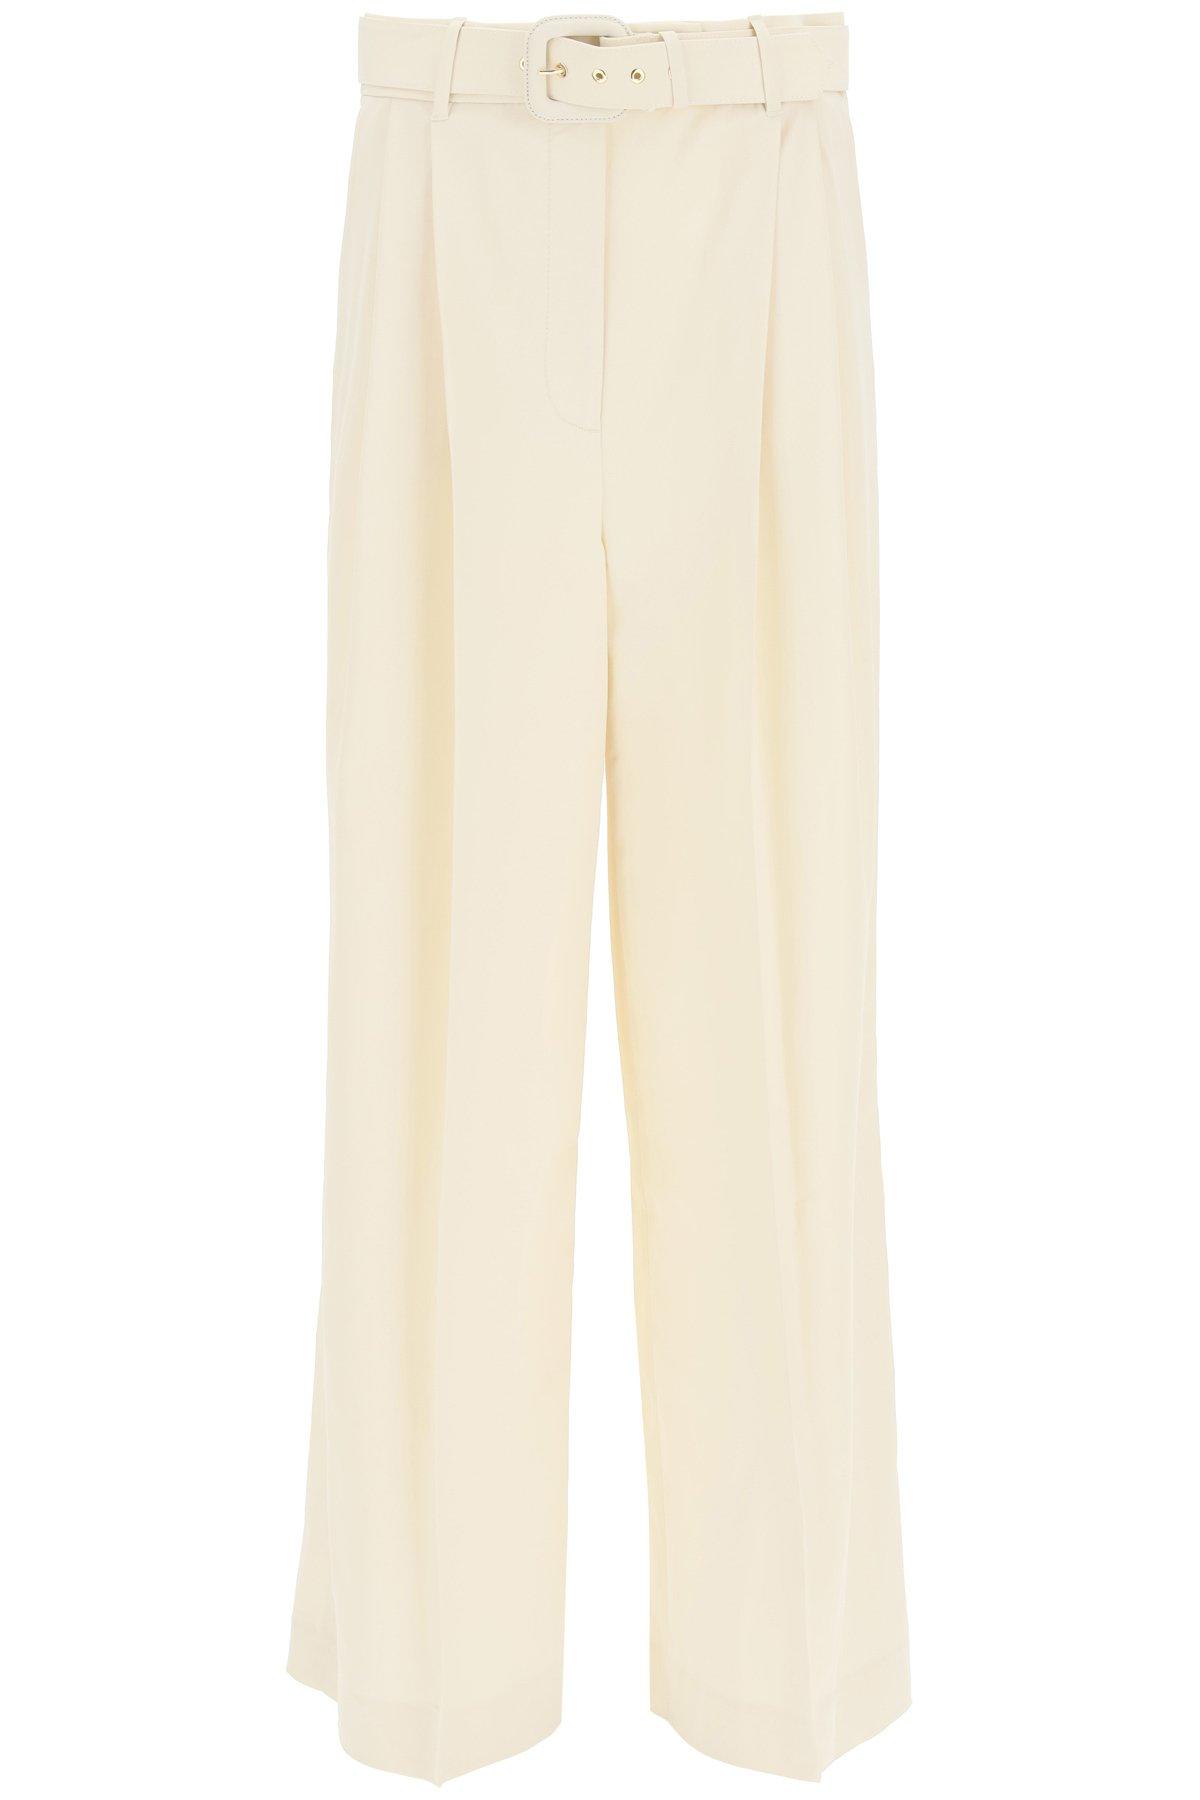 Zimmermann pantalone largo con cintura